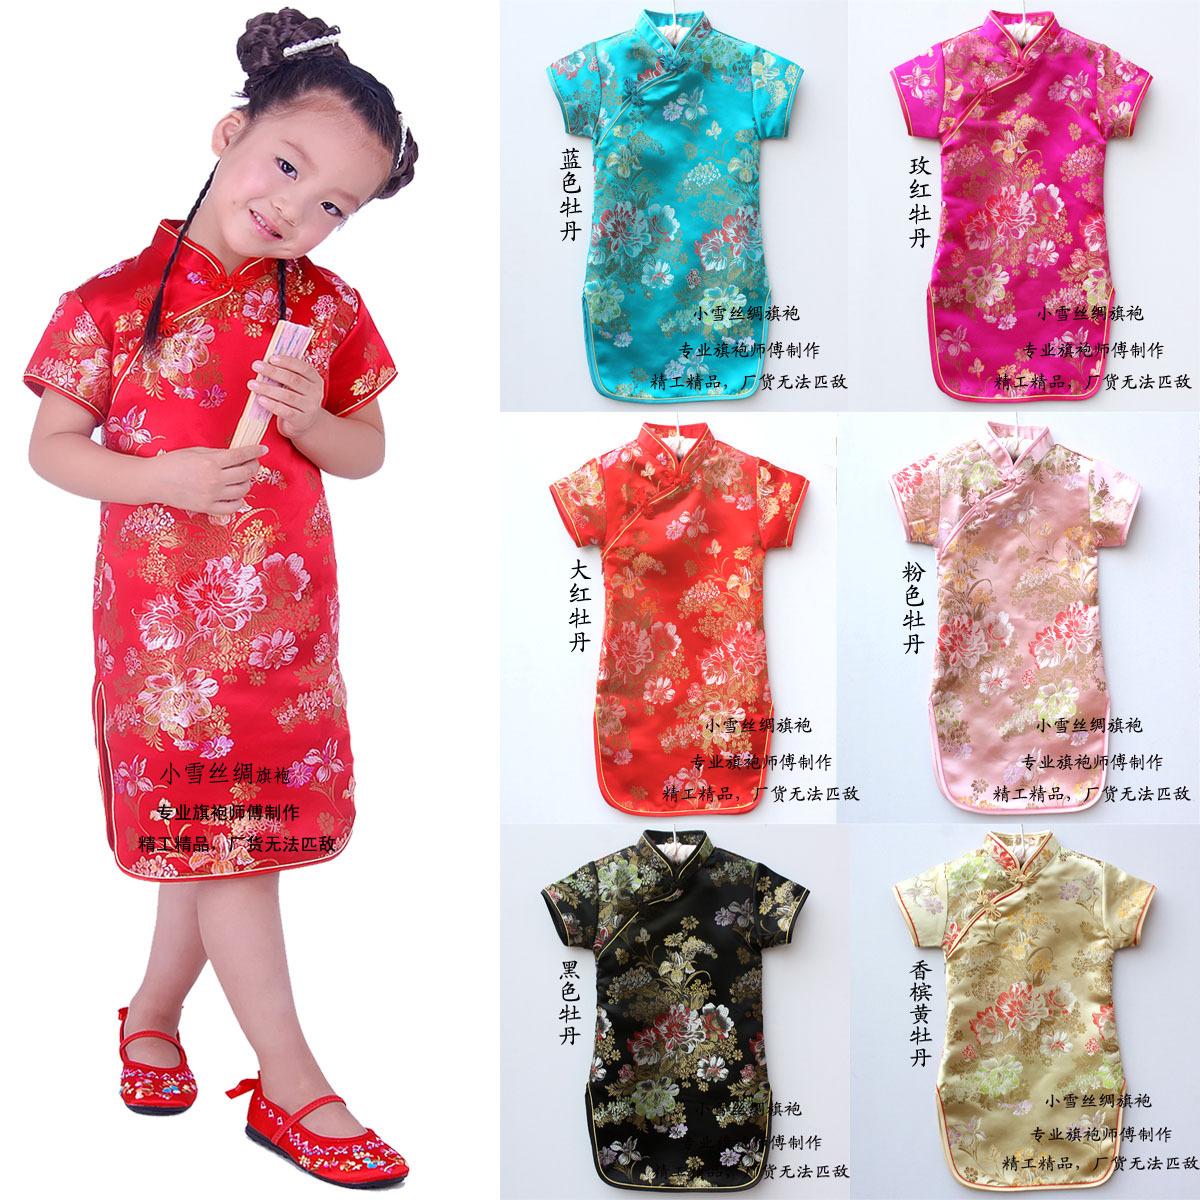 китайский костюм для девочки своими руками